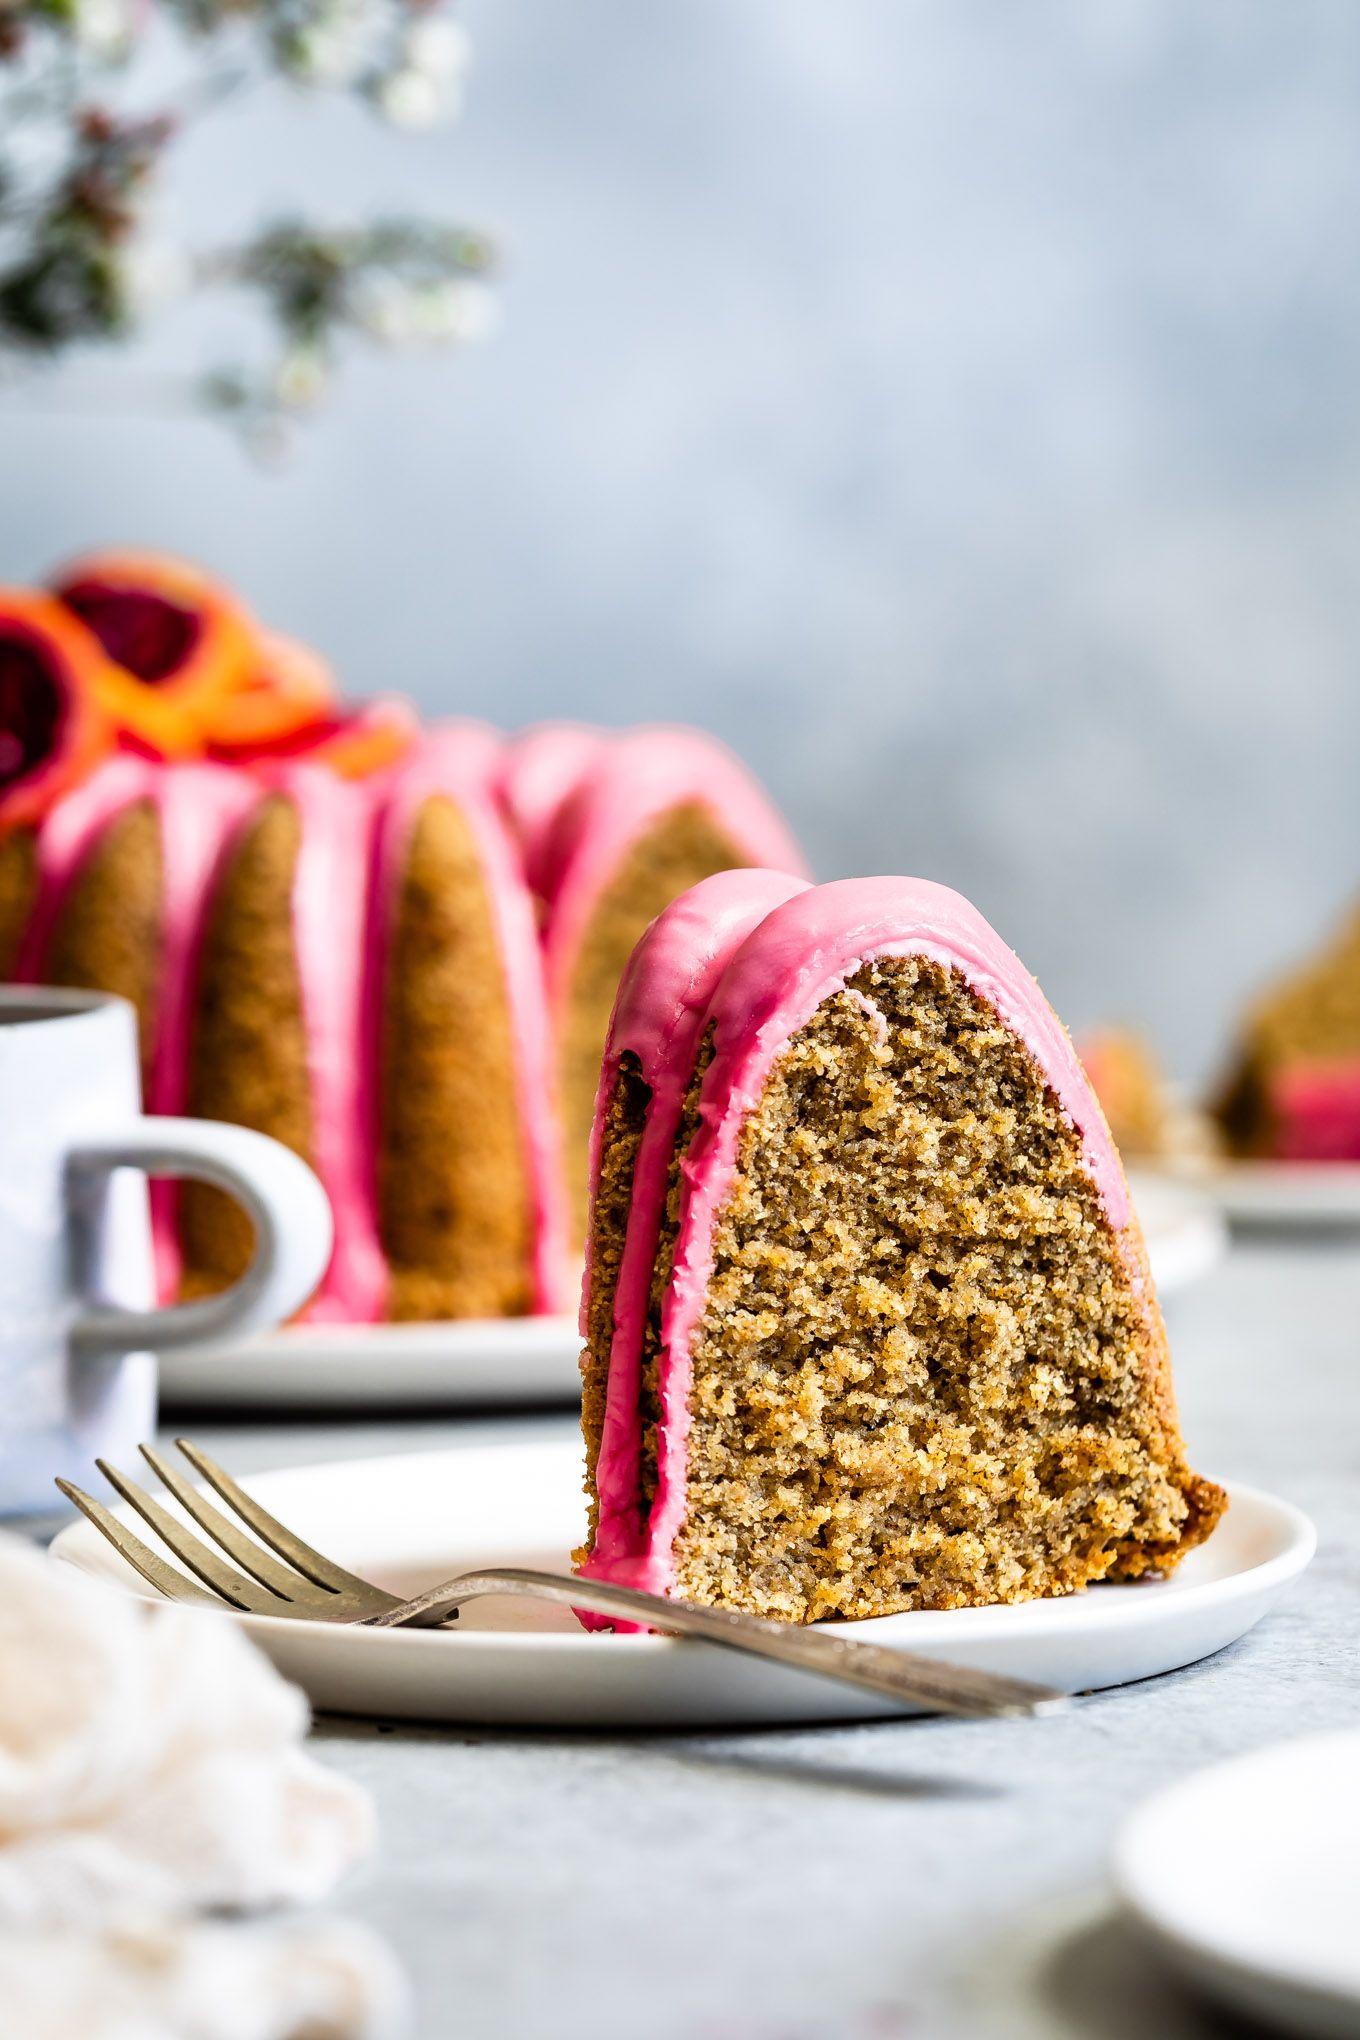 Earl grey glutenfree bundt cake with blood orange icing